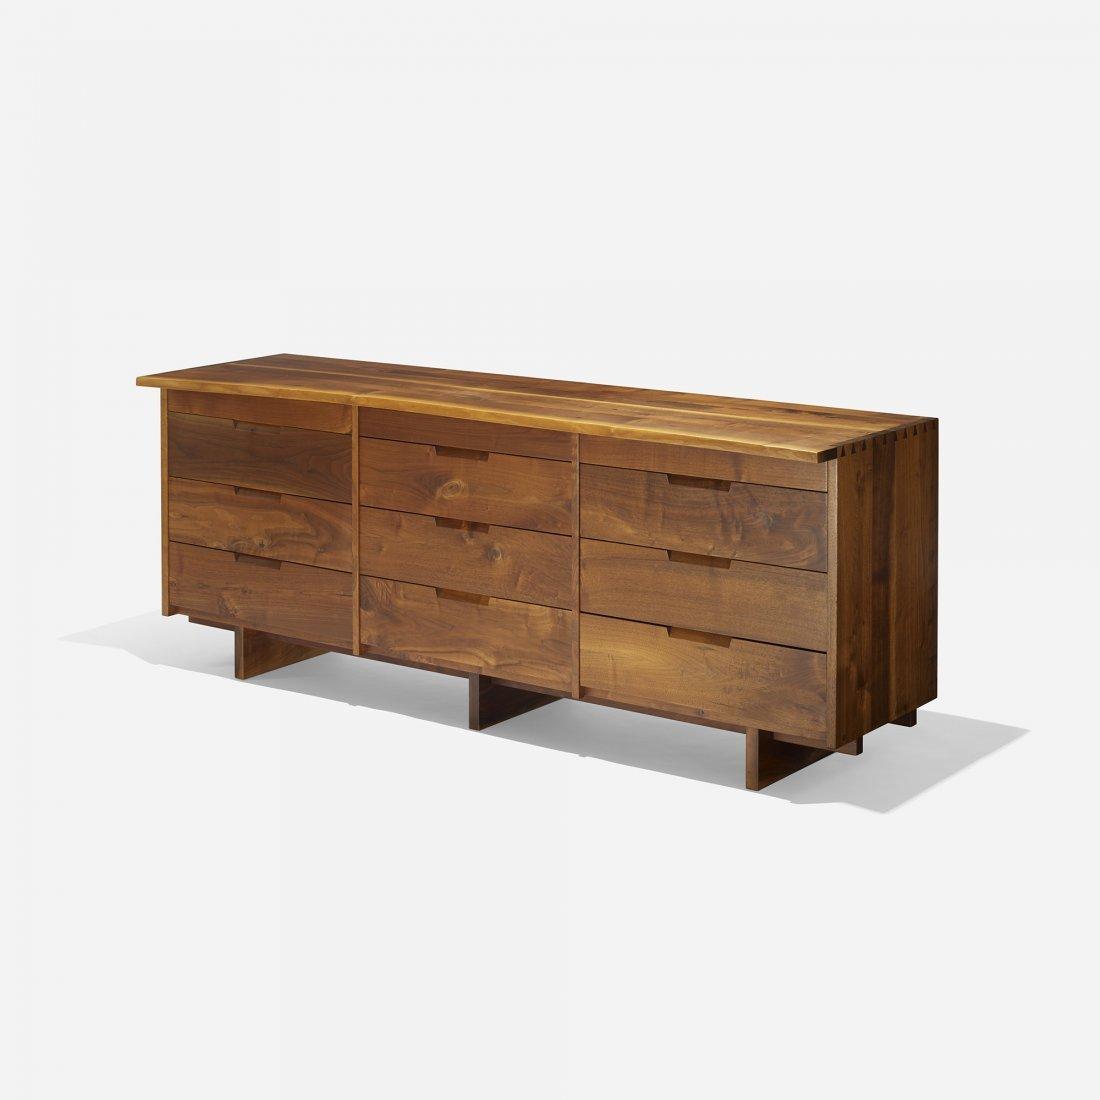 George Nakashima Triple chest of drawers